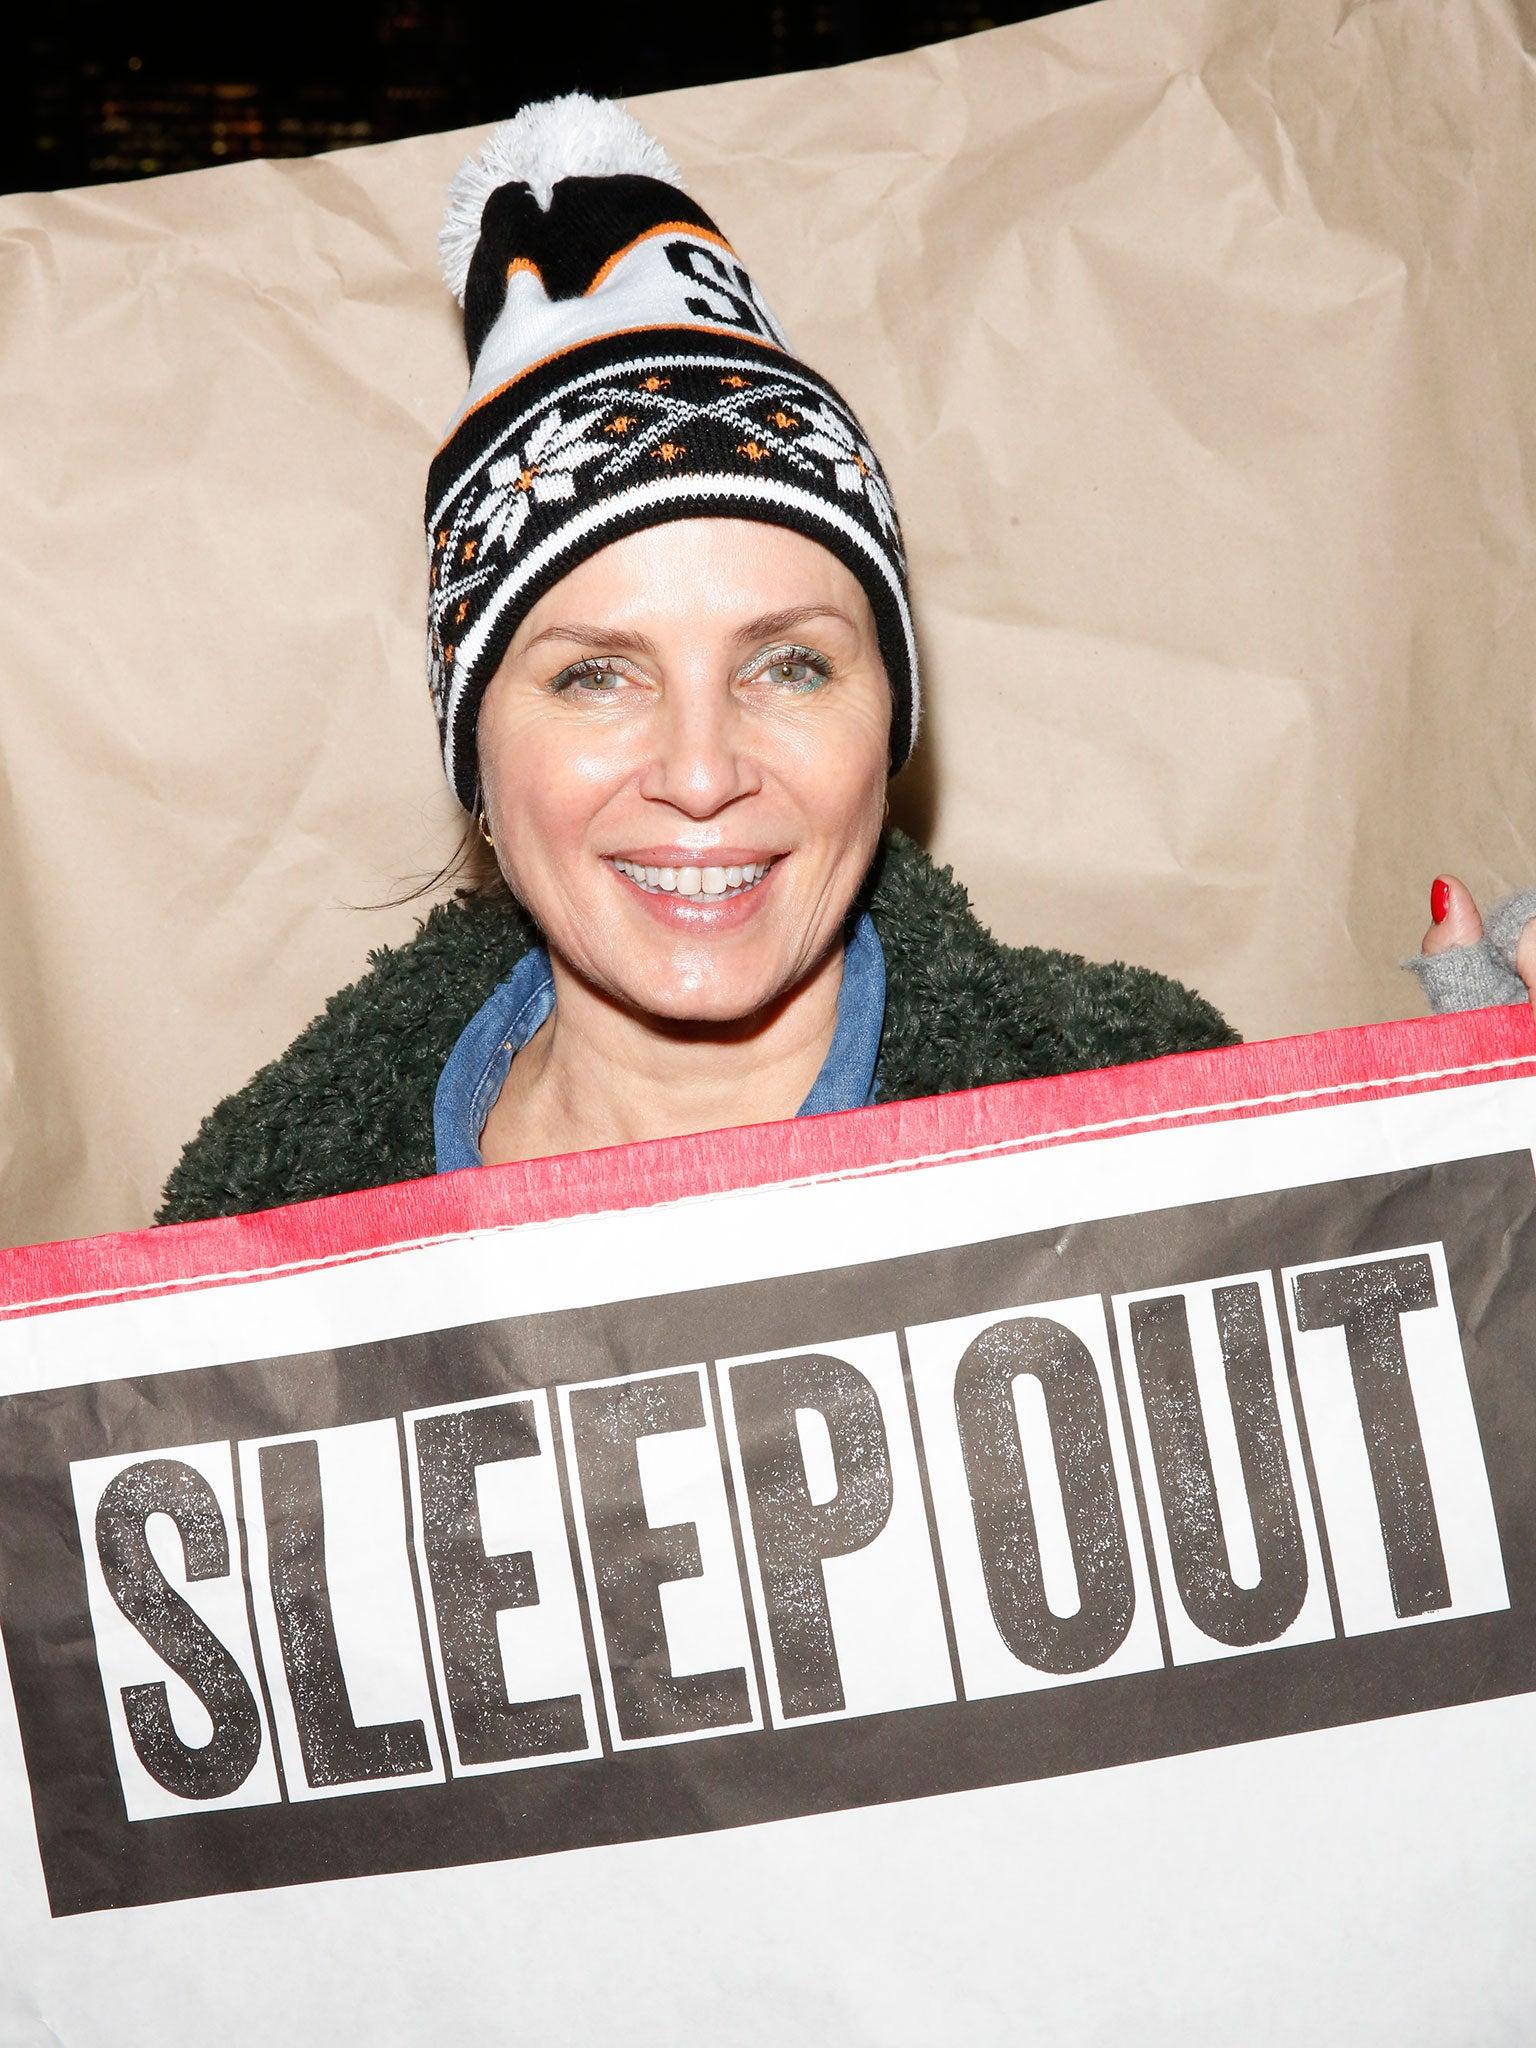 How to get the perfect amount of sleep based on your sleep